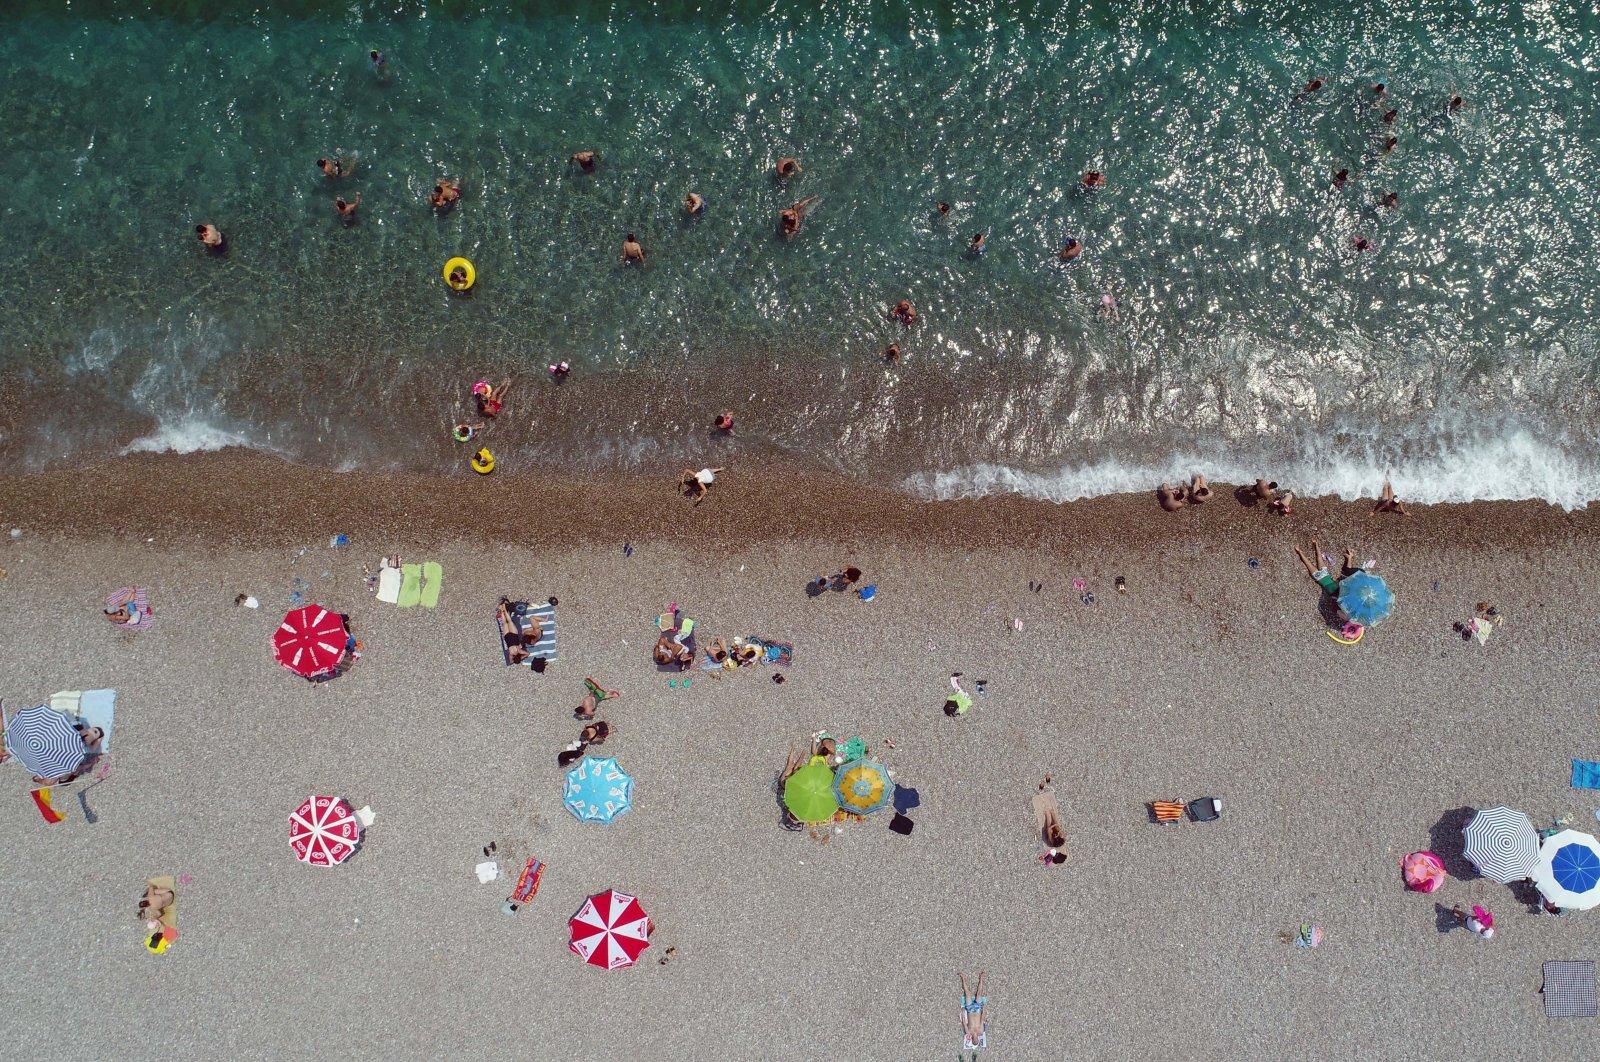 Holidaymakers enjoy the sun at Konyalatı beach in southern resort city Antalya, Turkey, Aug. 2, 2020. (DHA Photo)